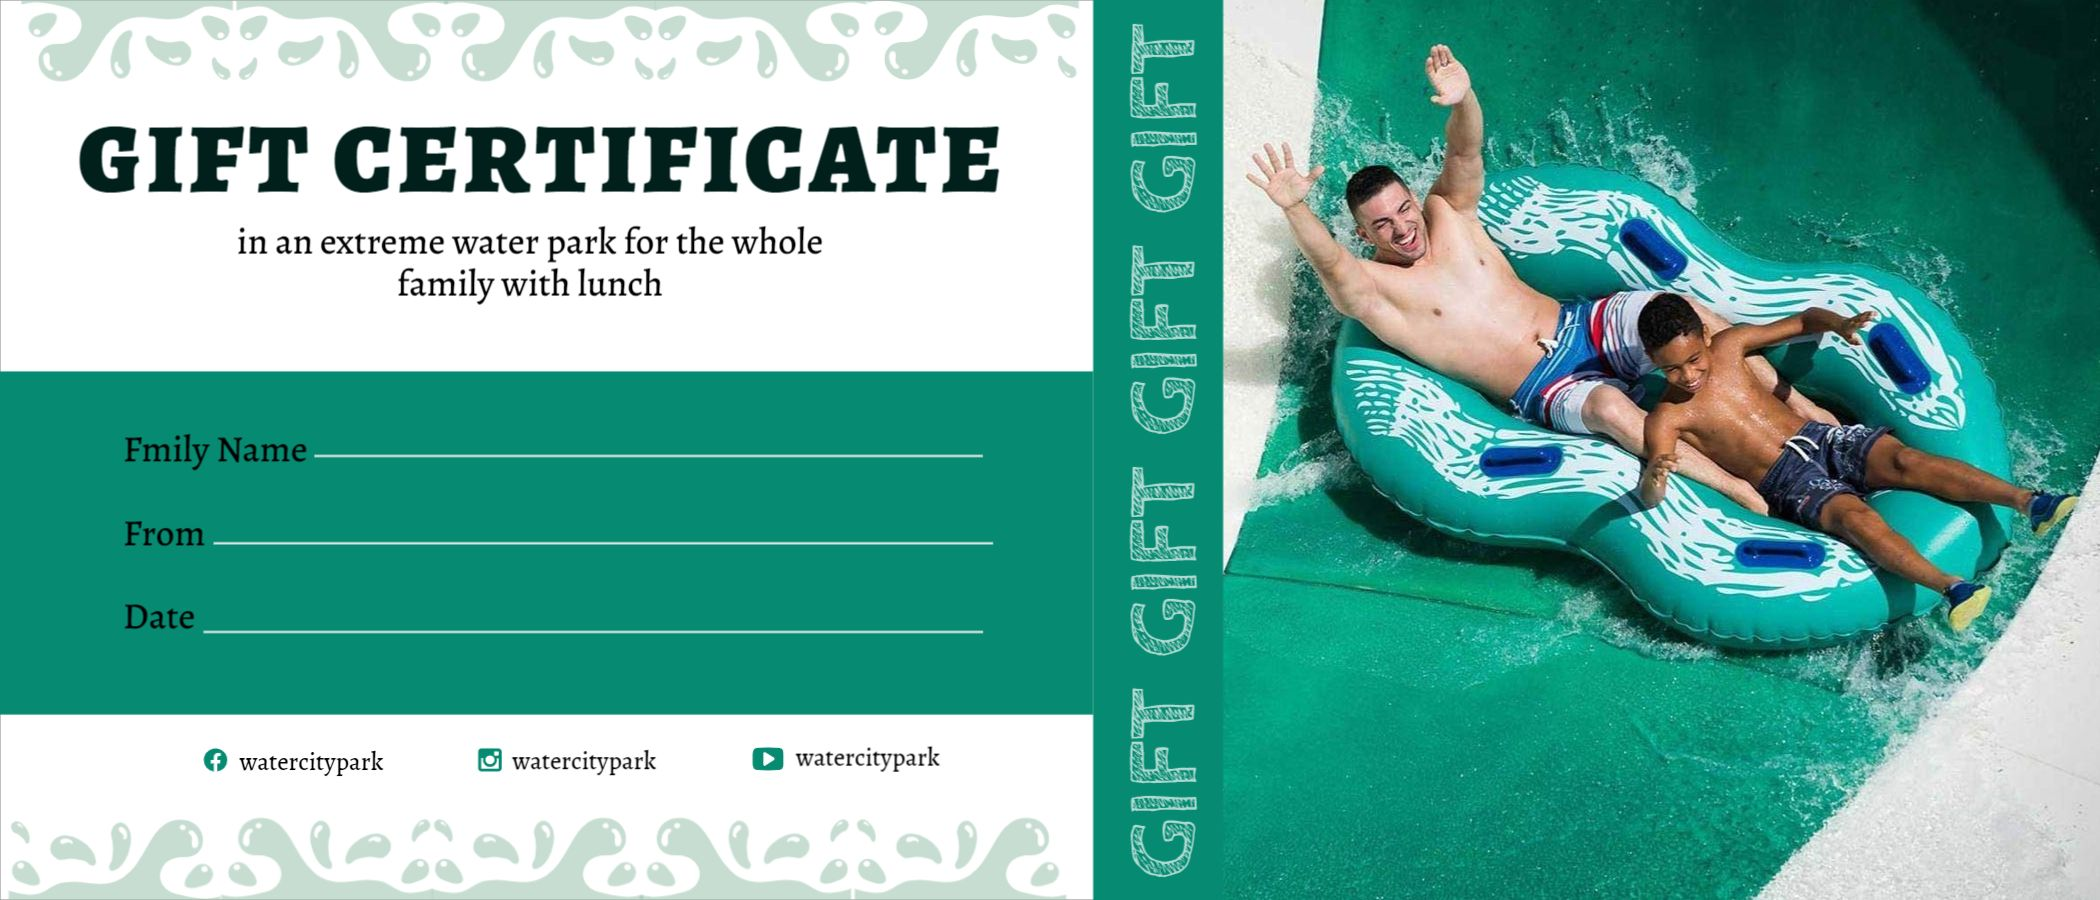 Water Park Gift Certificate Design